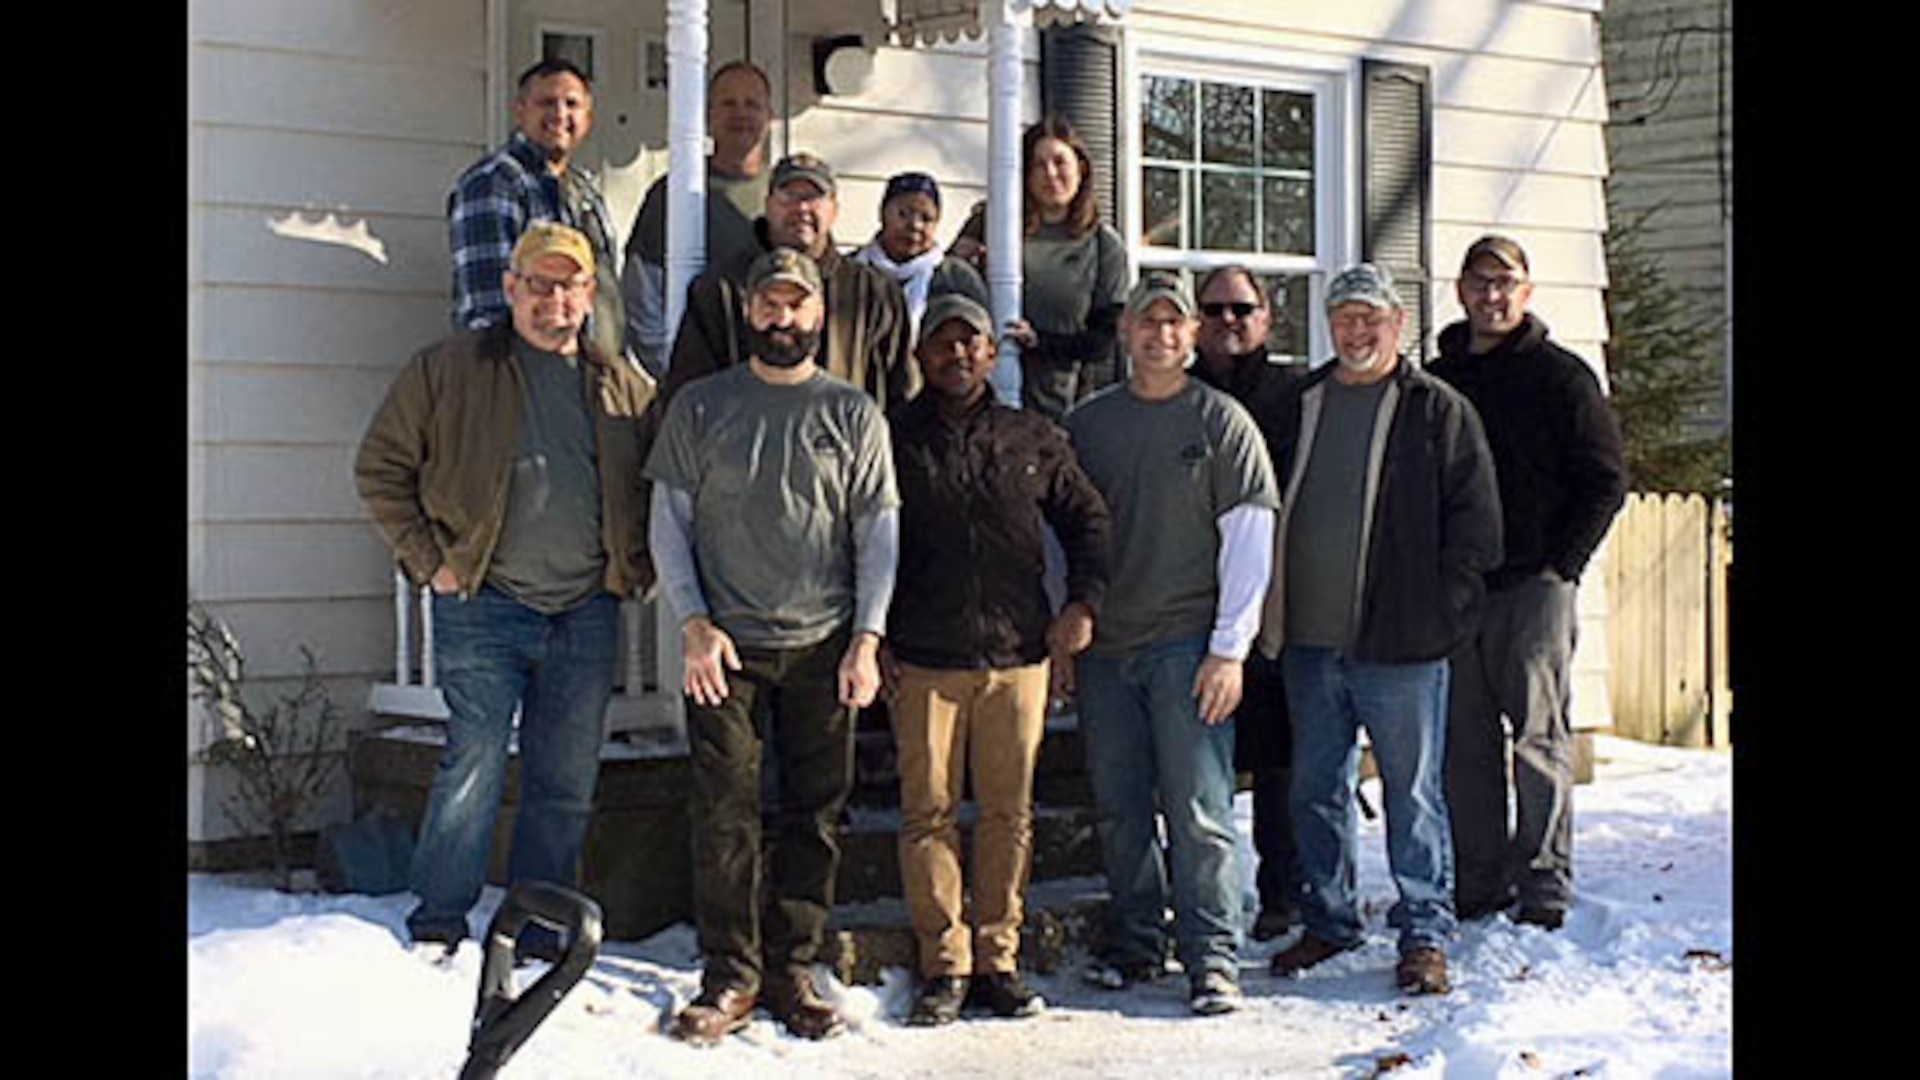 Twelve Defense Contract Management Agency Grand Rapids team members volunteered to renovate a local veteran's new home.